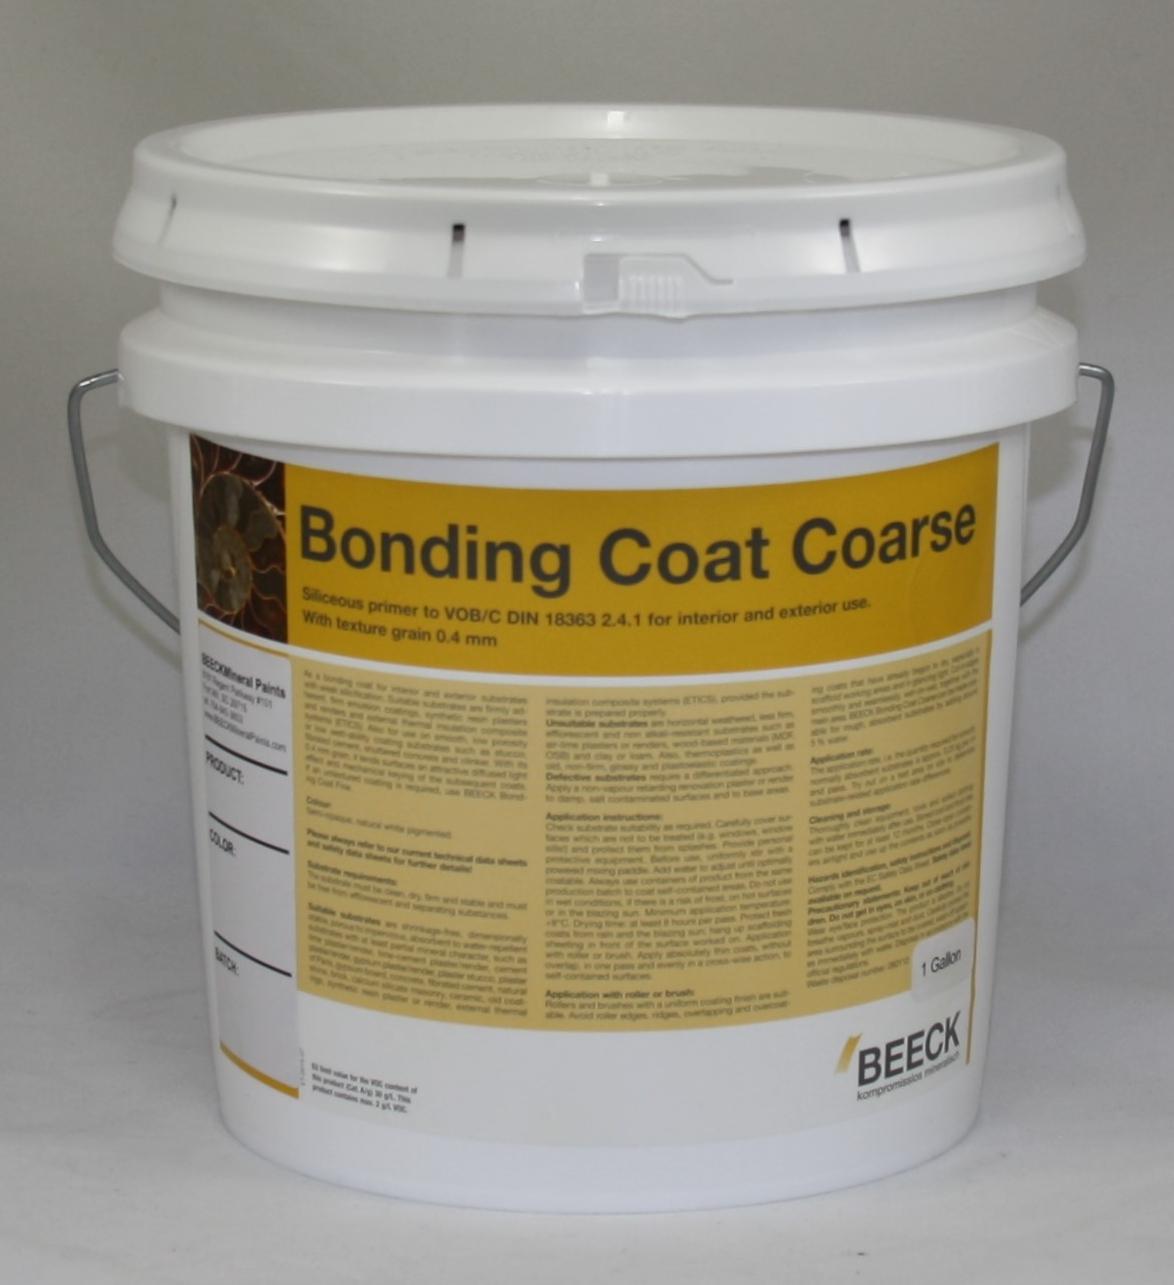 Bonding Coat Coarse 1 Gallon.jpg